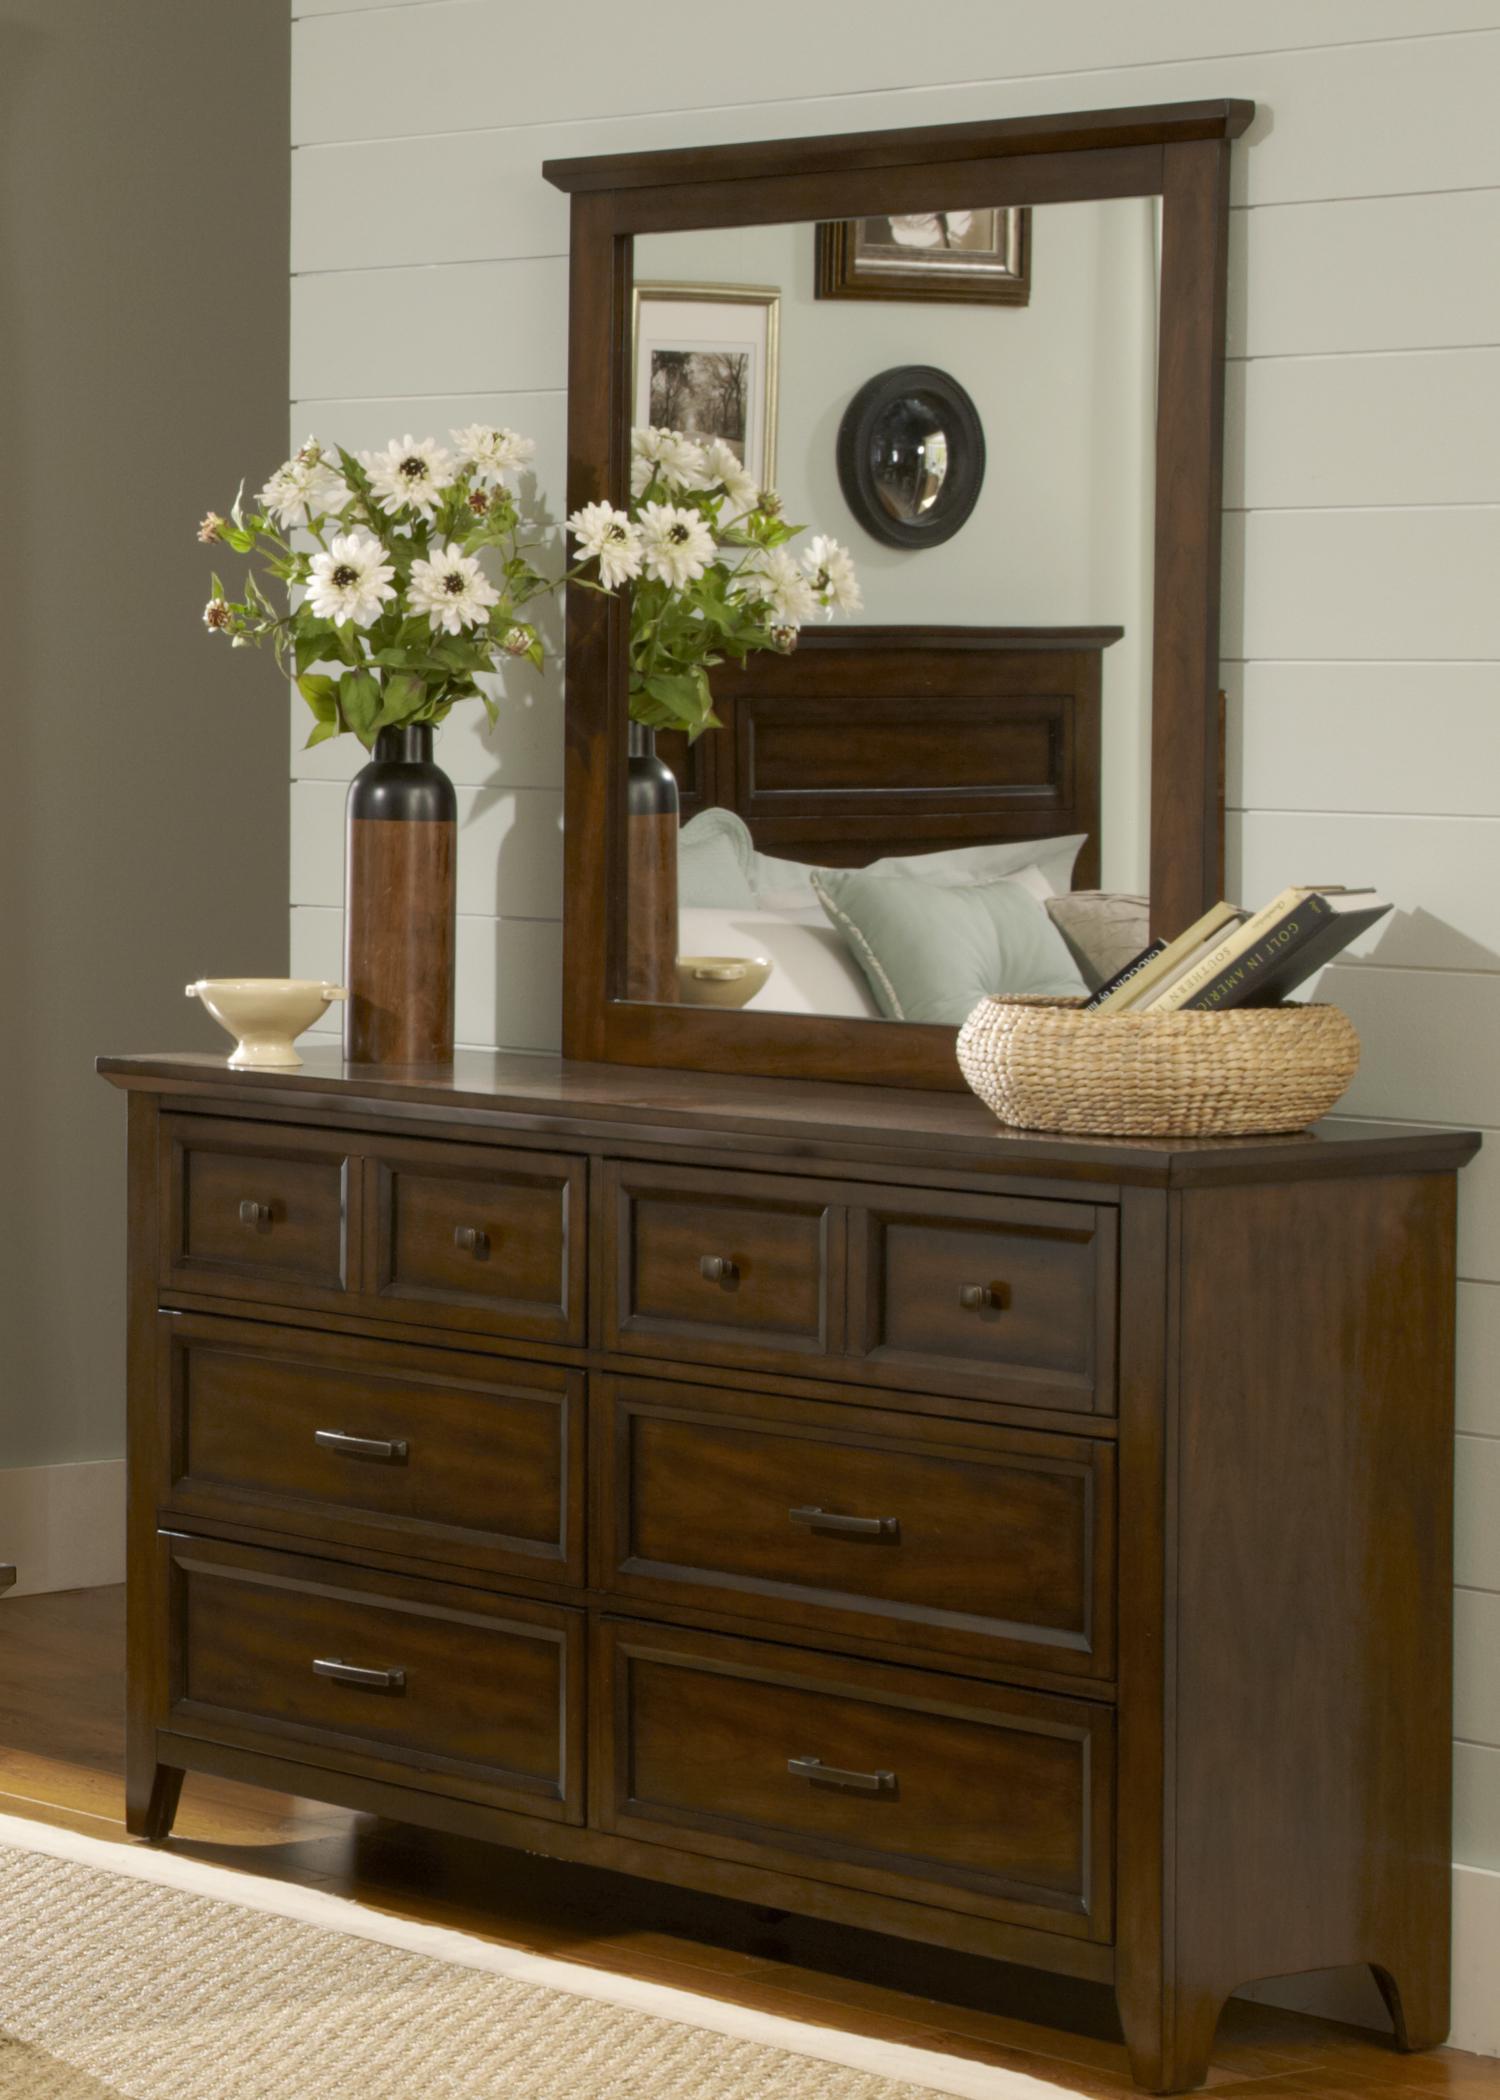 Liberty Furniture Laurel Creek Dresser & Mirror  - Item Number: 461-BR-SET50